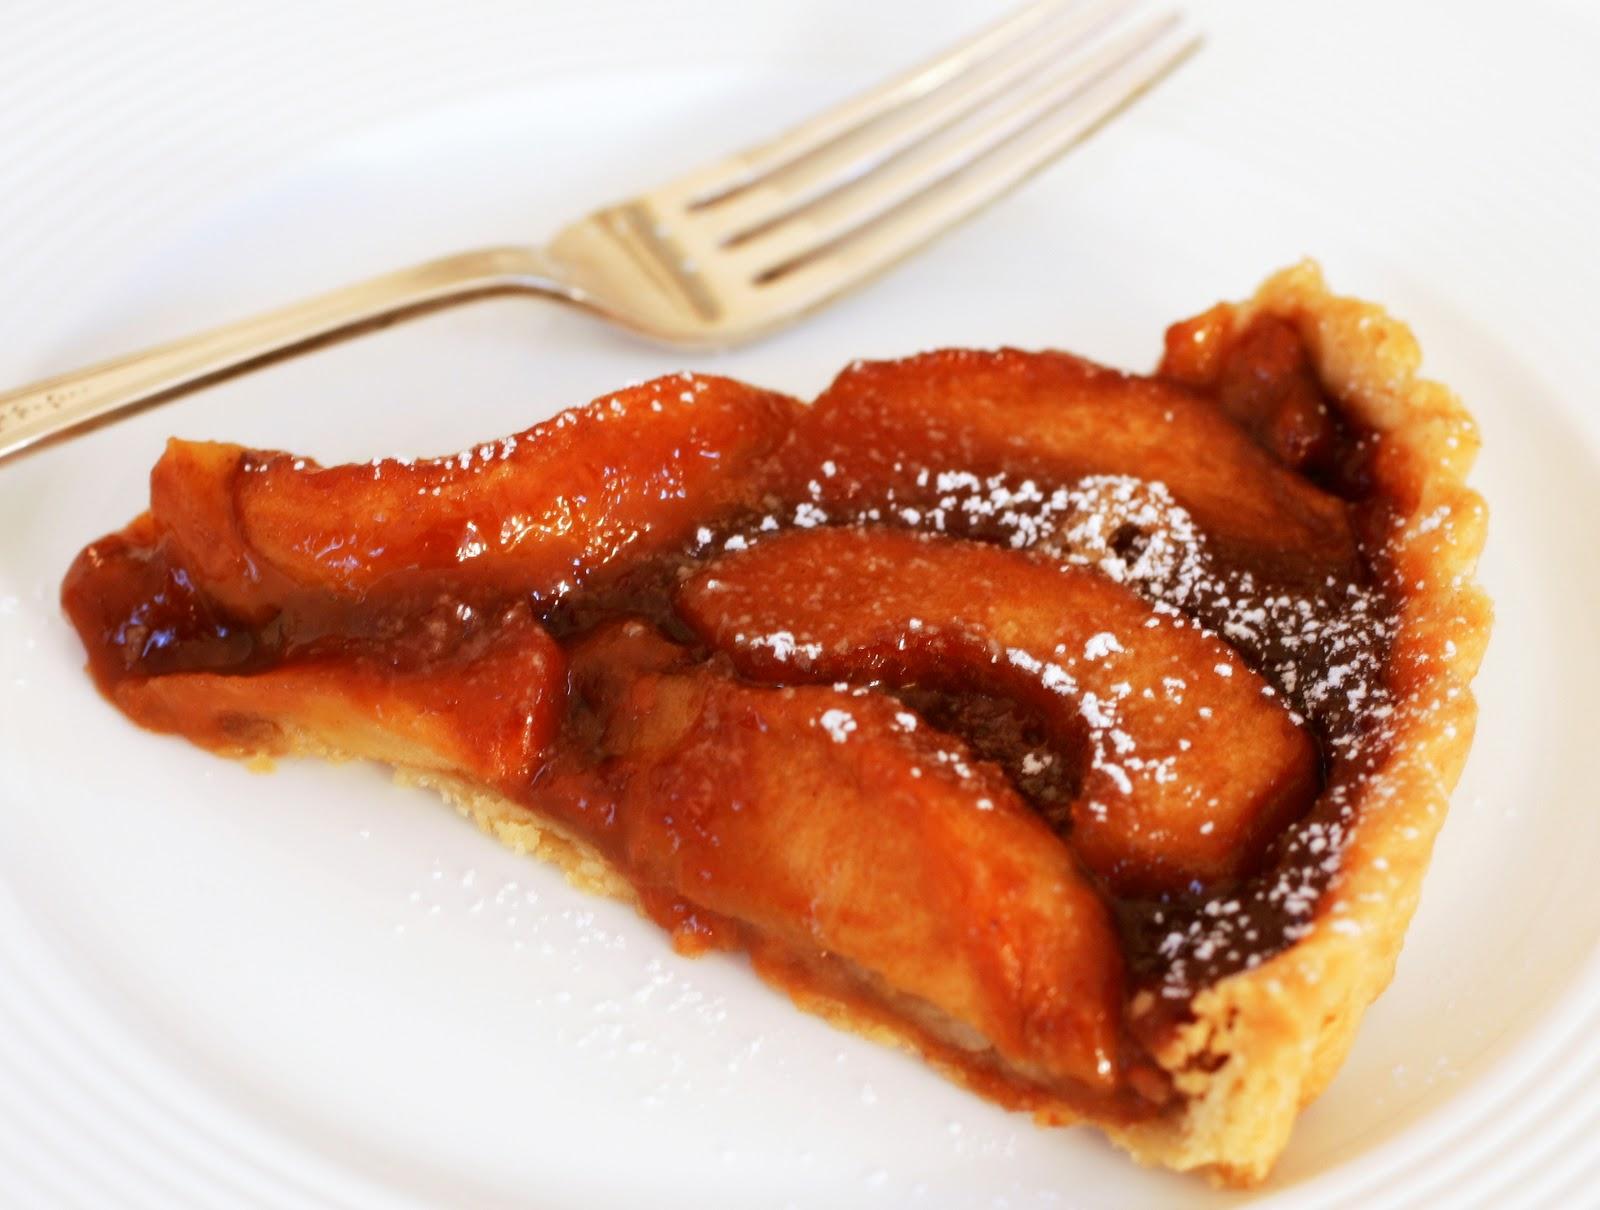 Tish Boyle Sweet Dreams: Caramel Apple Tart